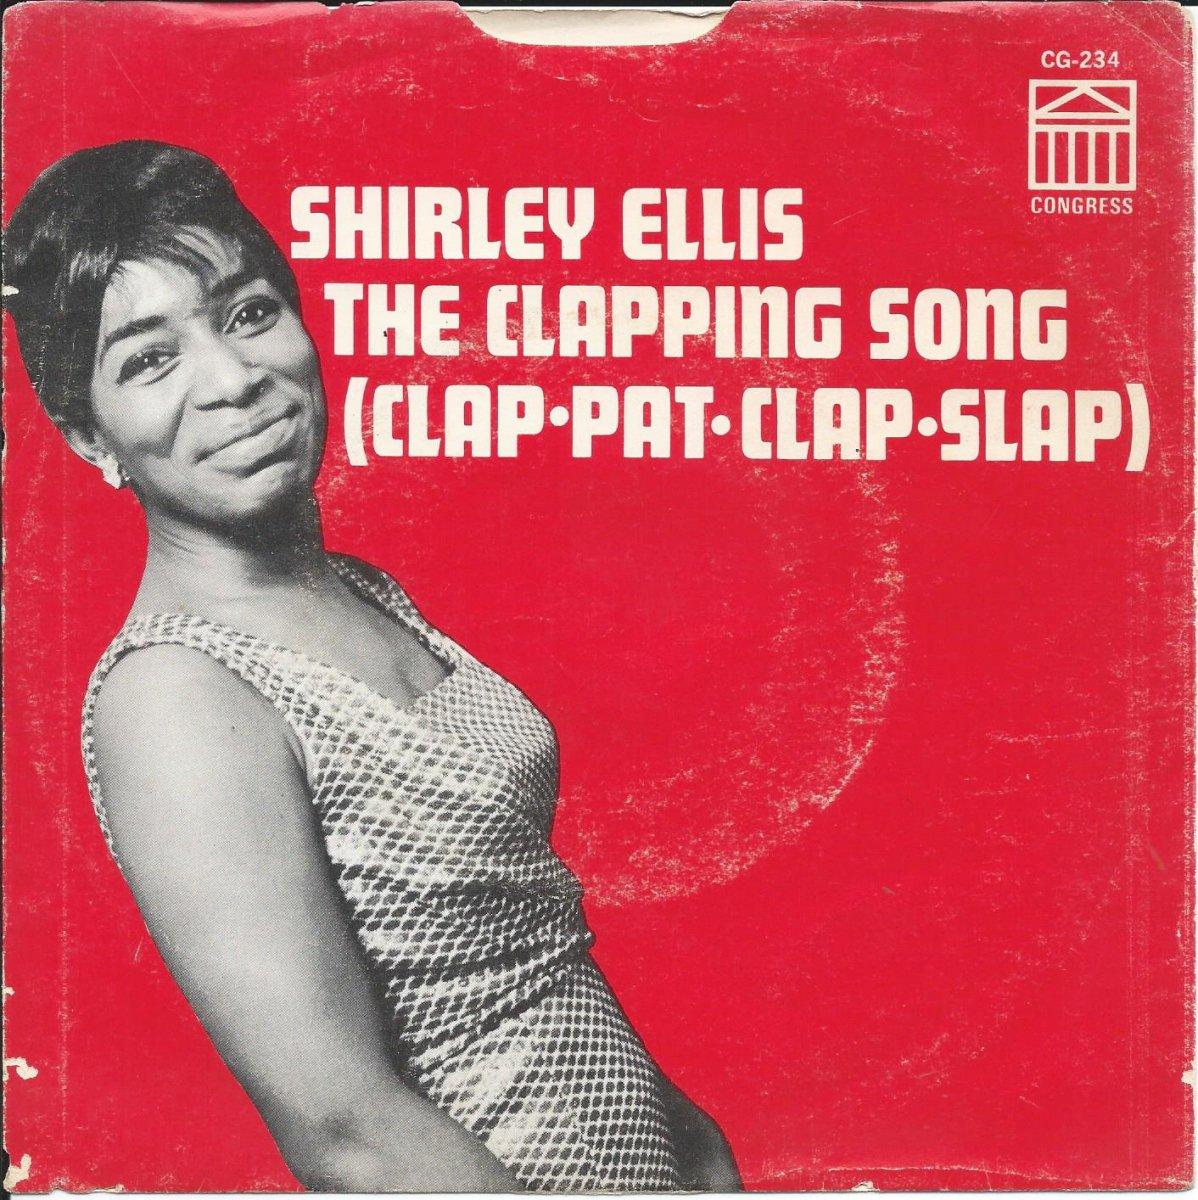 SHIRLEY ELLIS / THE CLAPPING SONG (CLAP PAT CLAP SLAP) (7